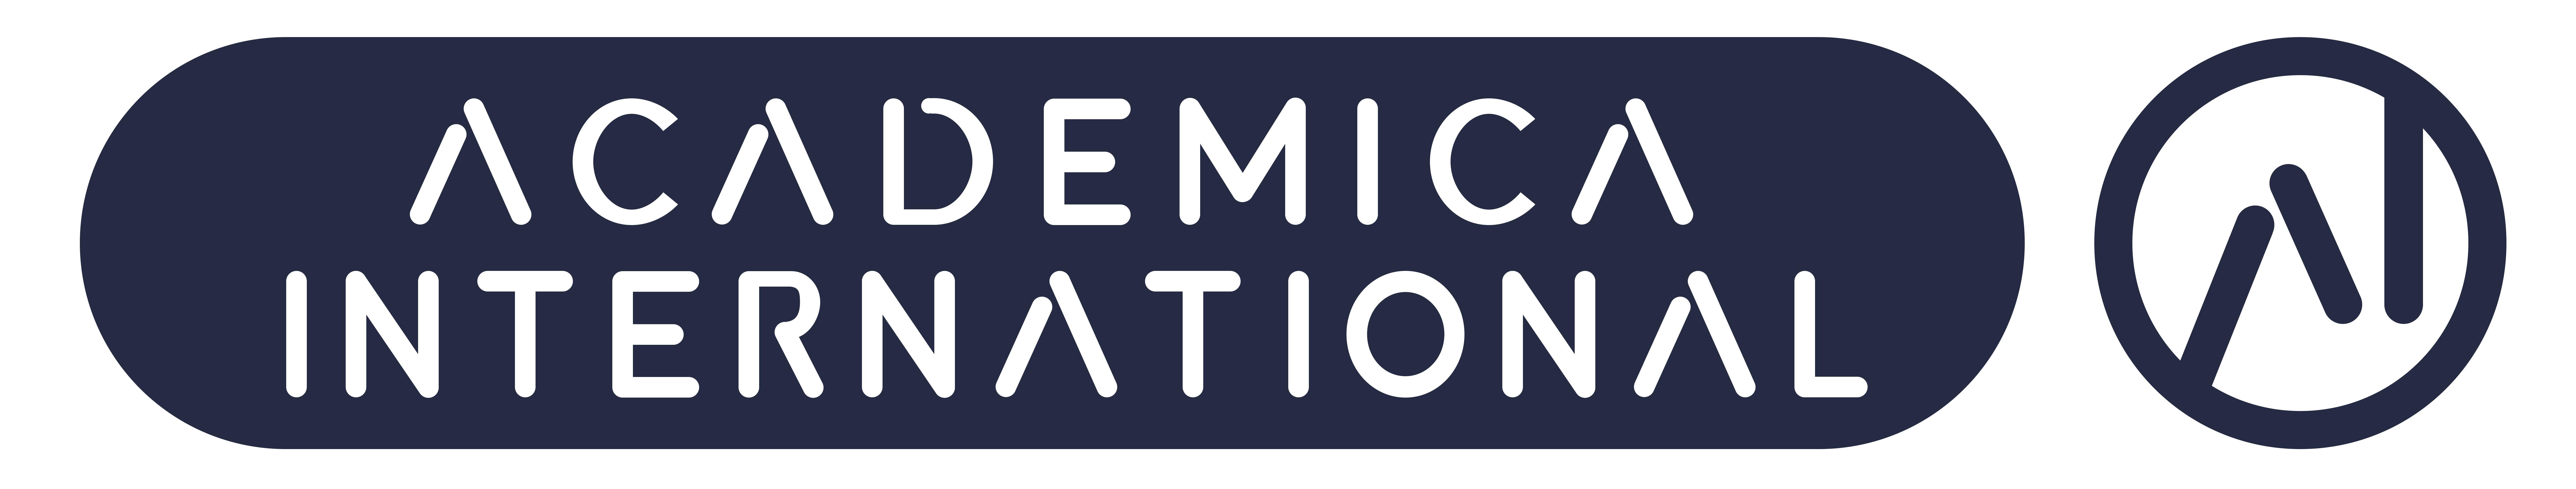 Academica International